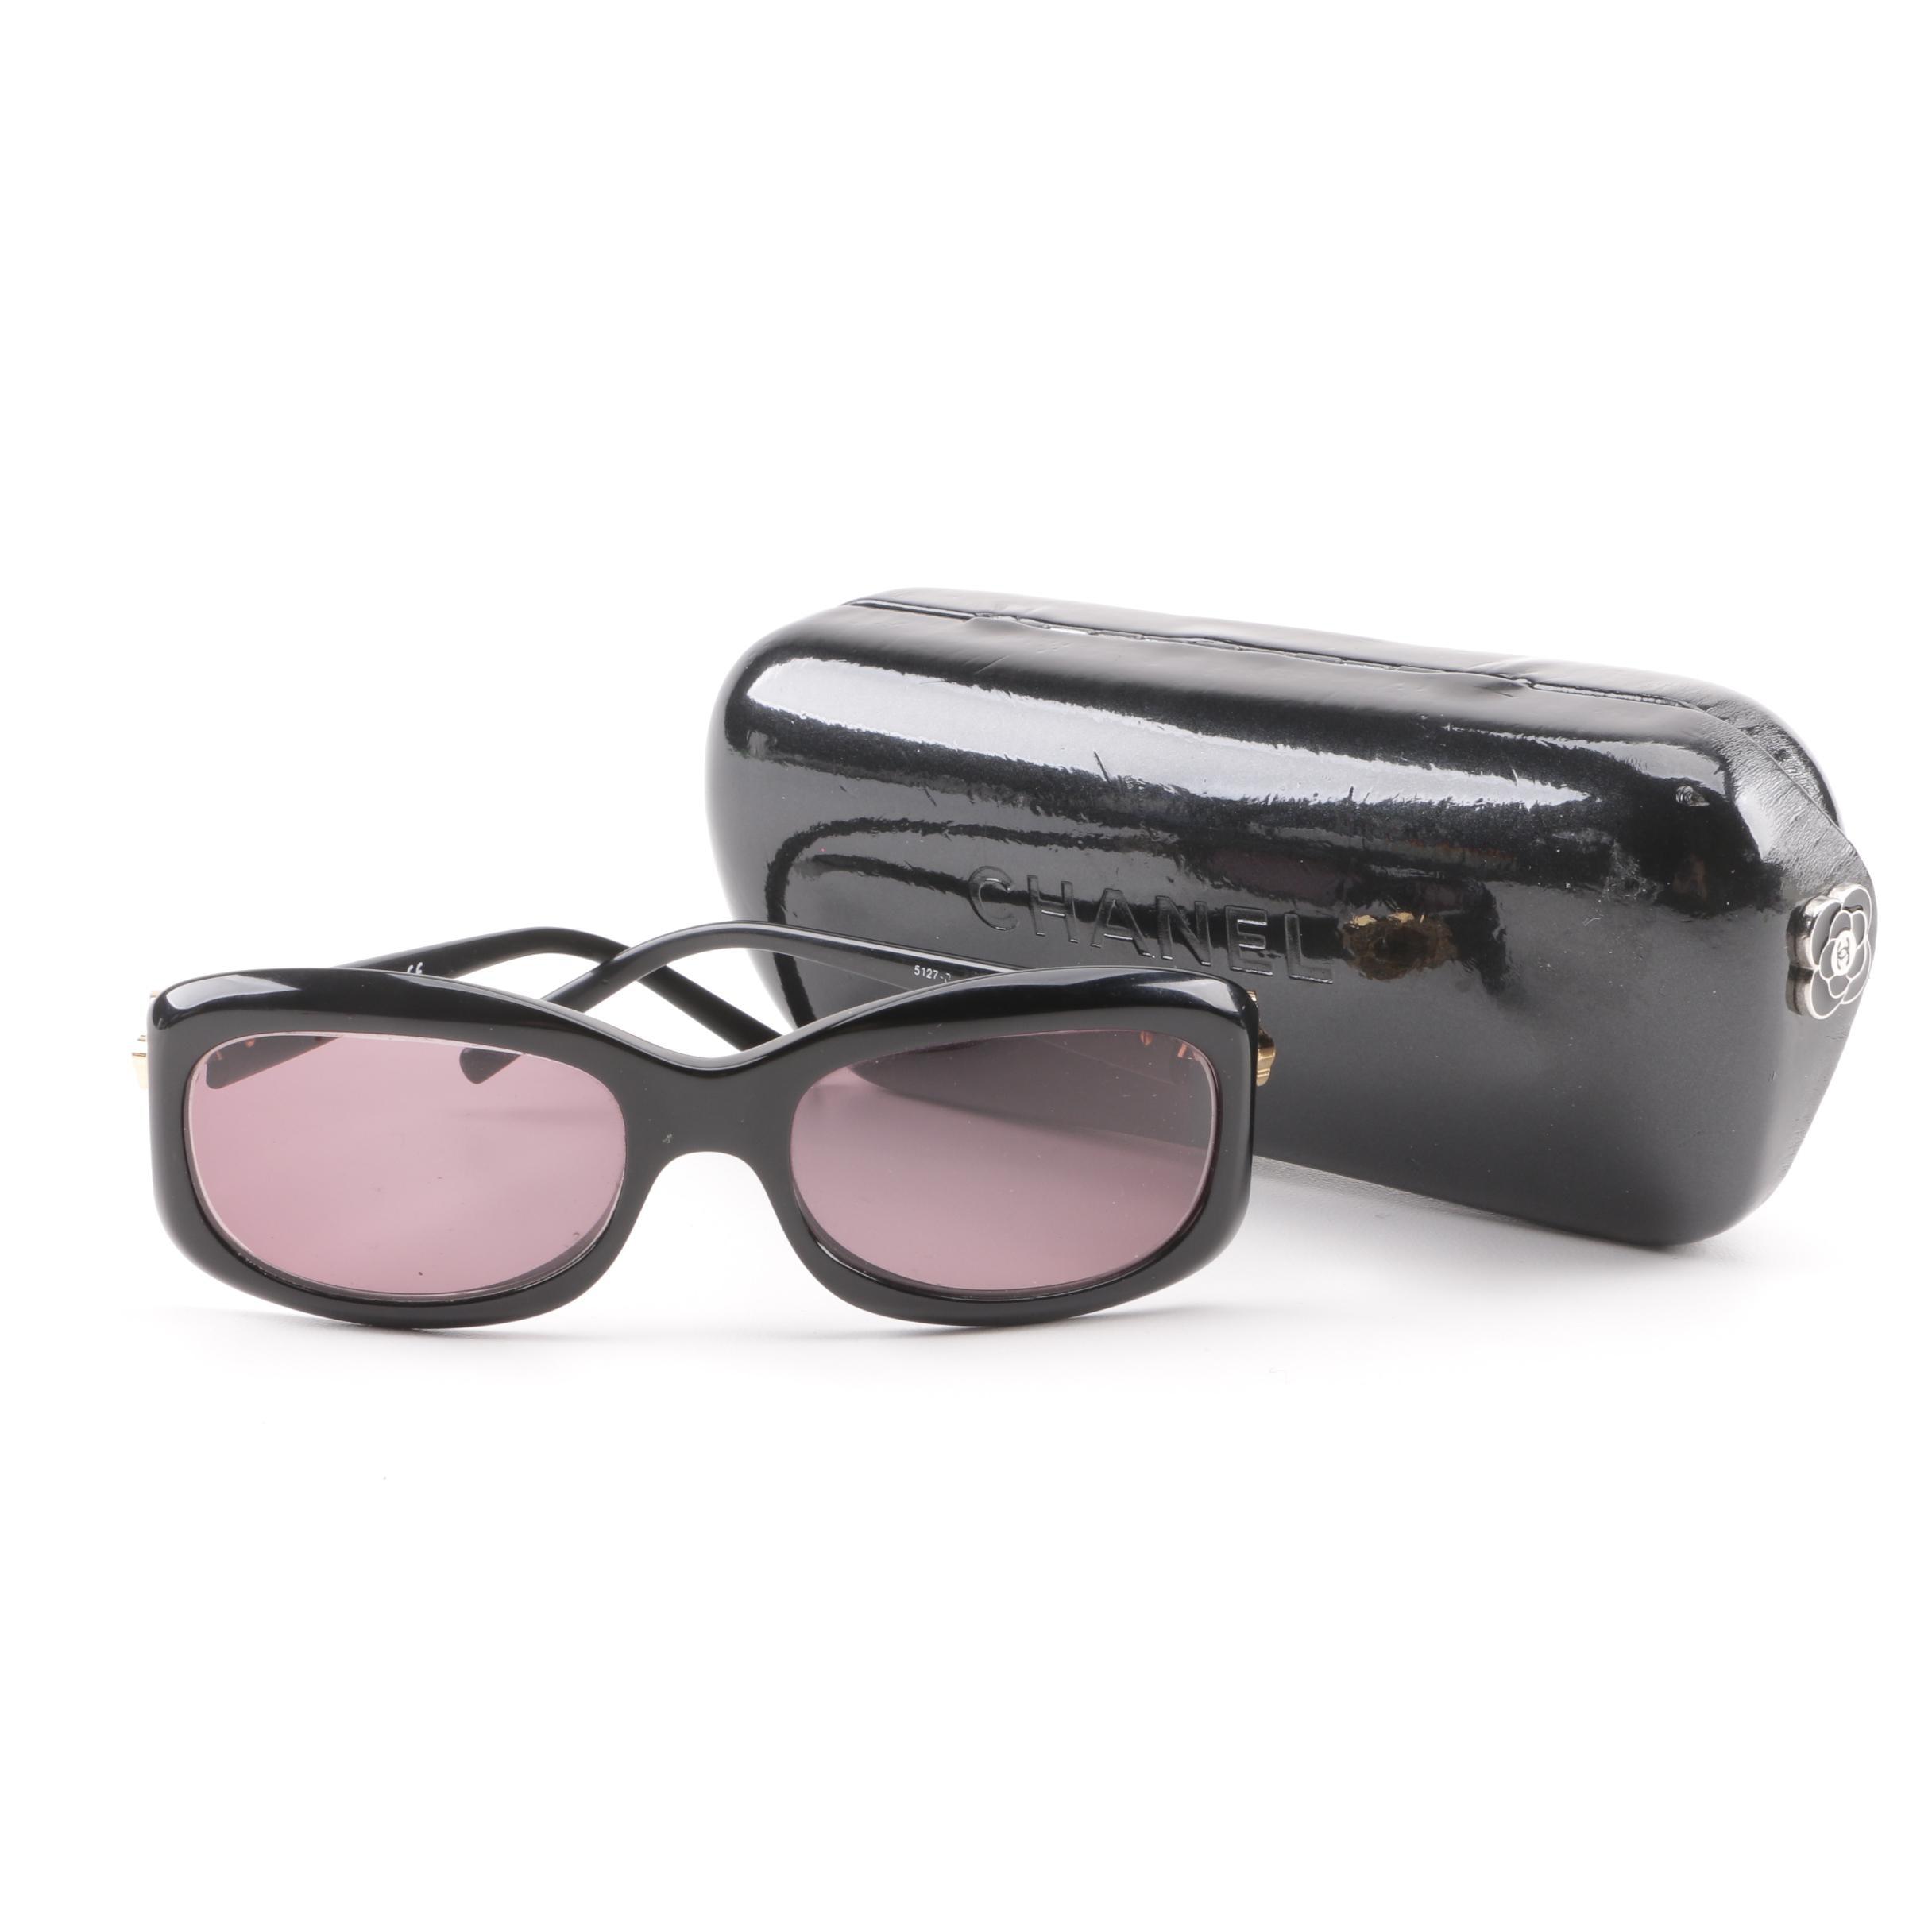 Chanel 5127-B Camellia Flower CC Logo Prescription Sunglasses with Case